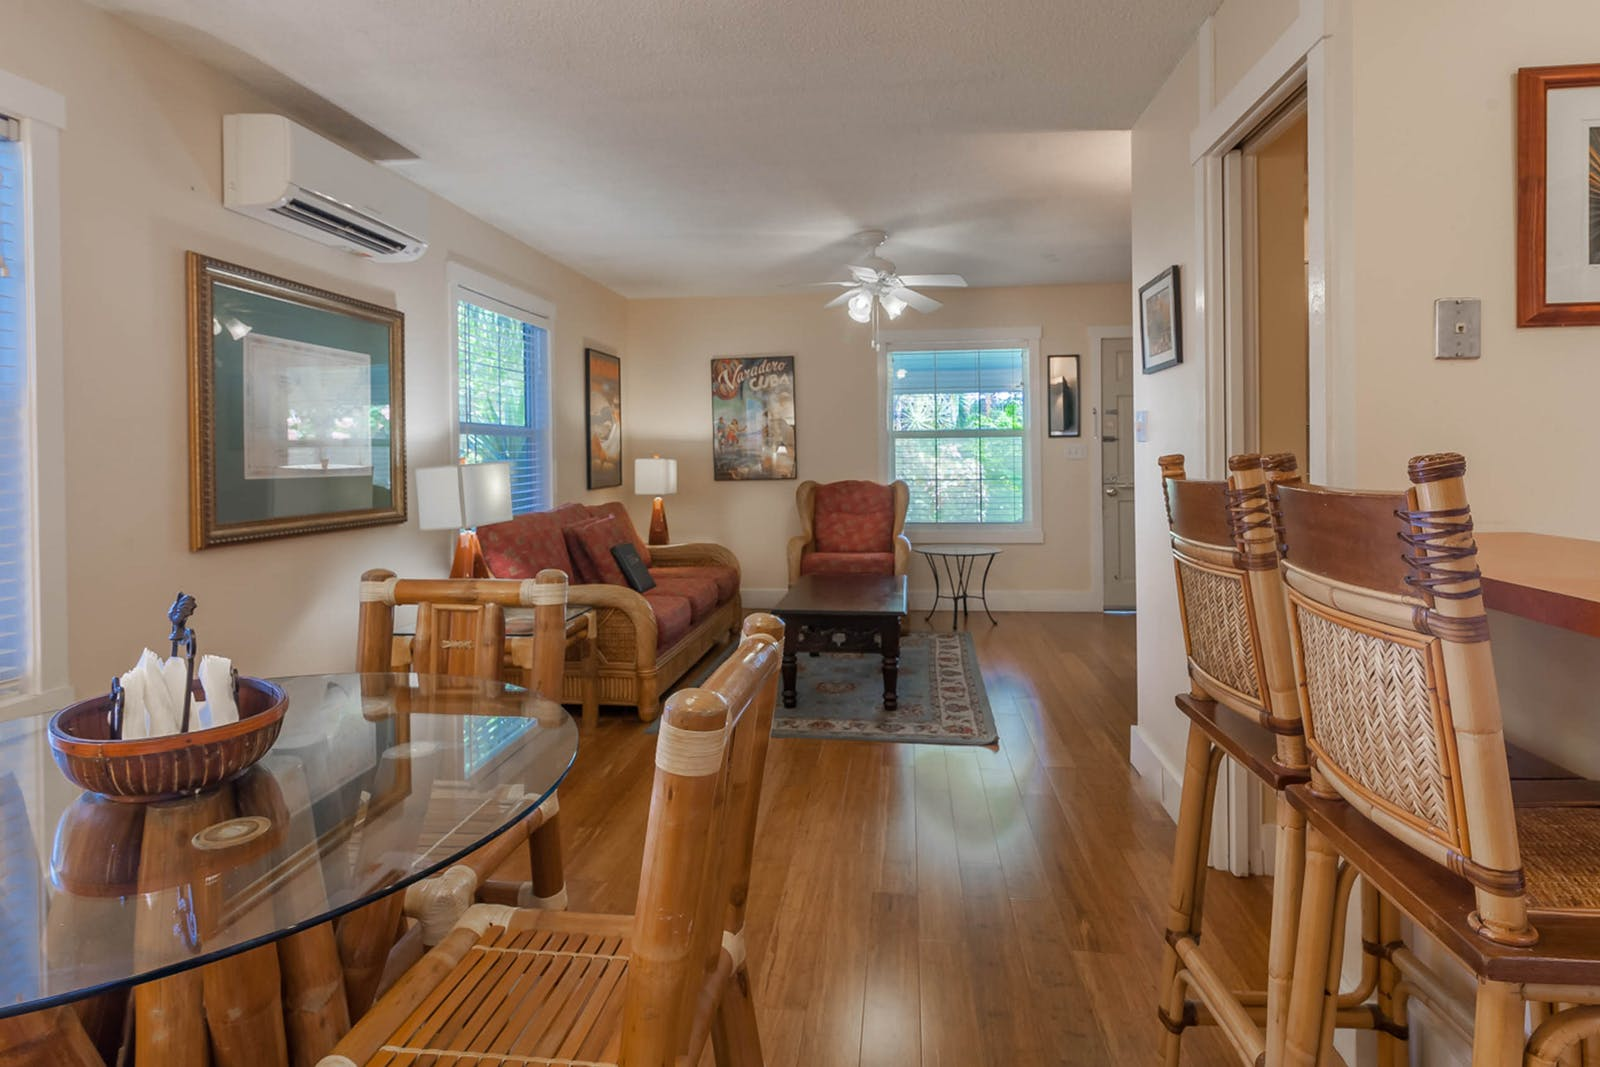 RENT Little Havana Suite - Nightly Rental | Key West Vacation Rental